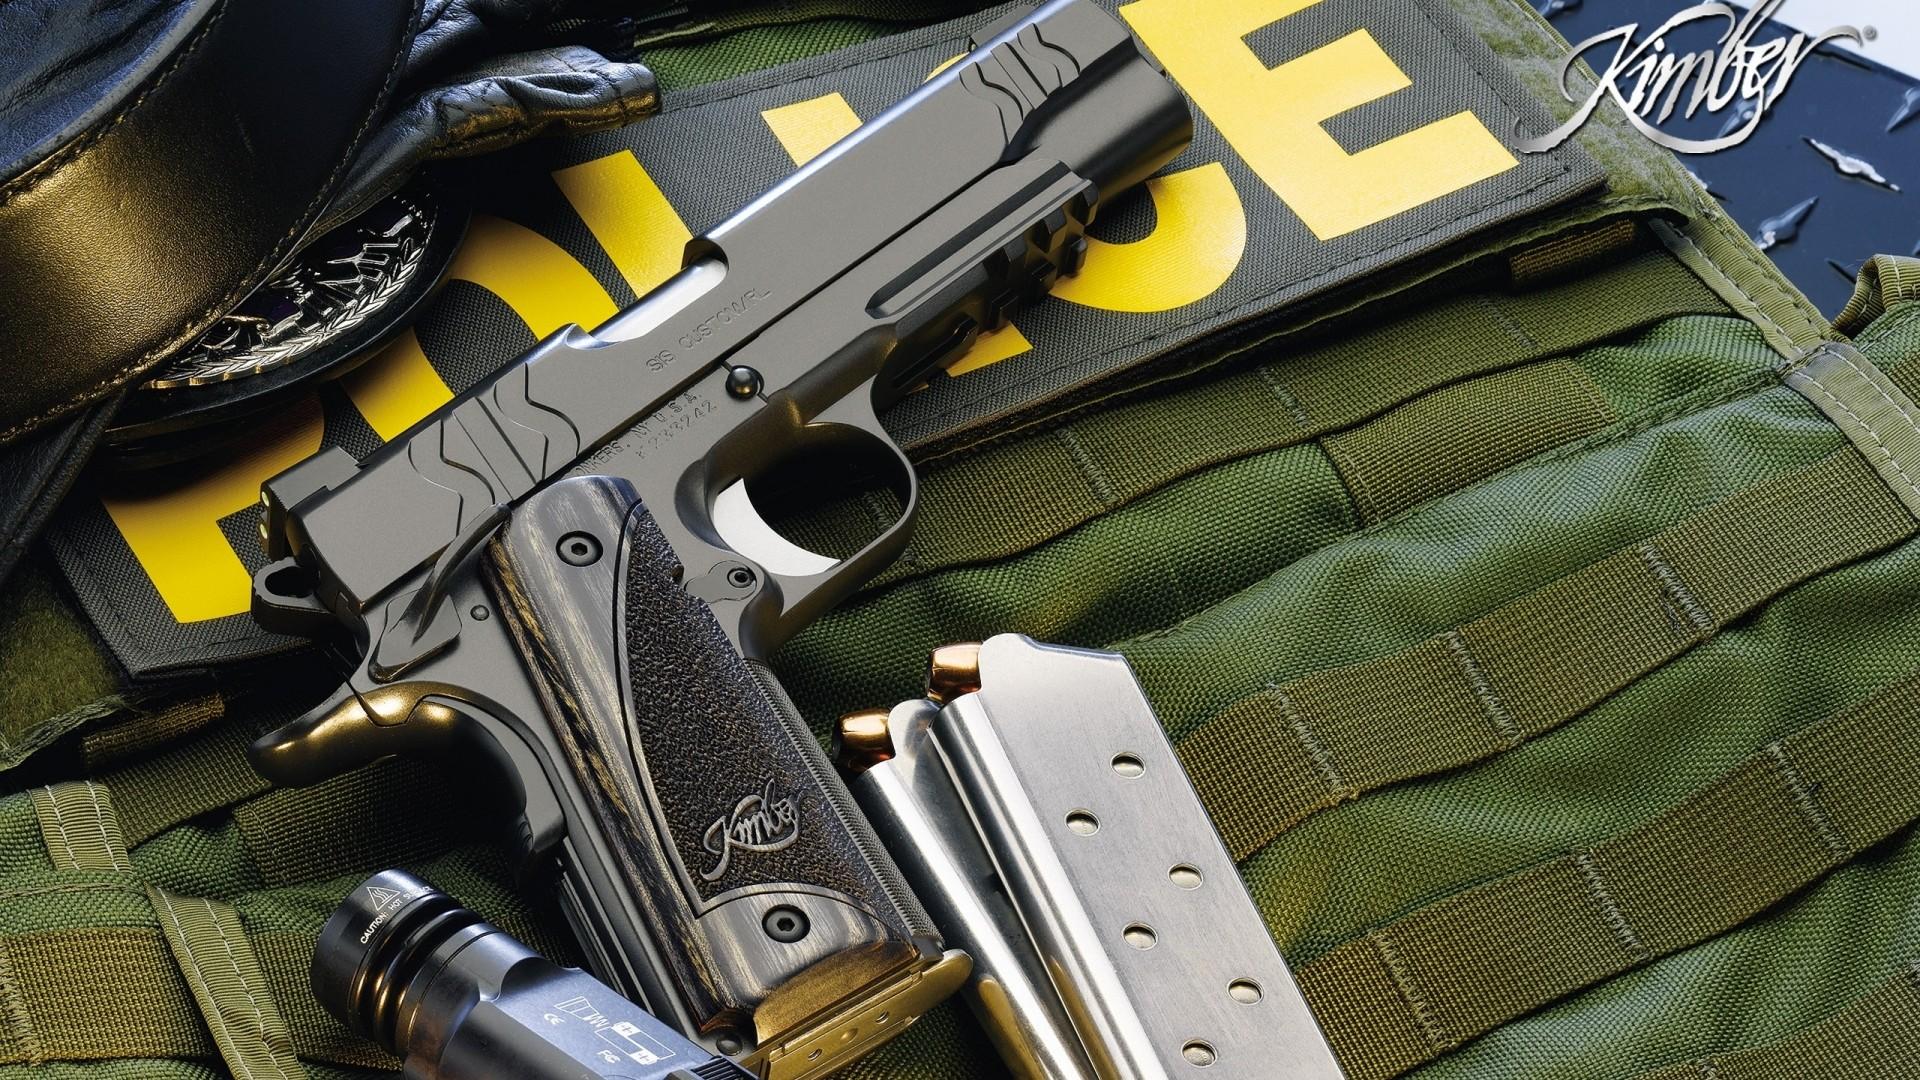 Wallpaper police, guns, gun, knife, defense